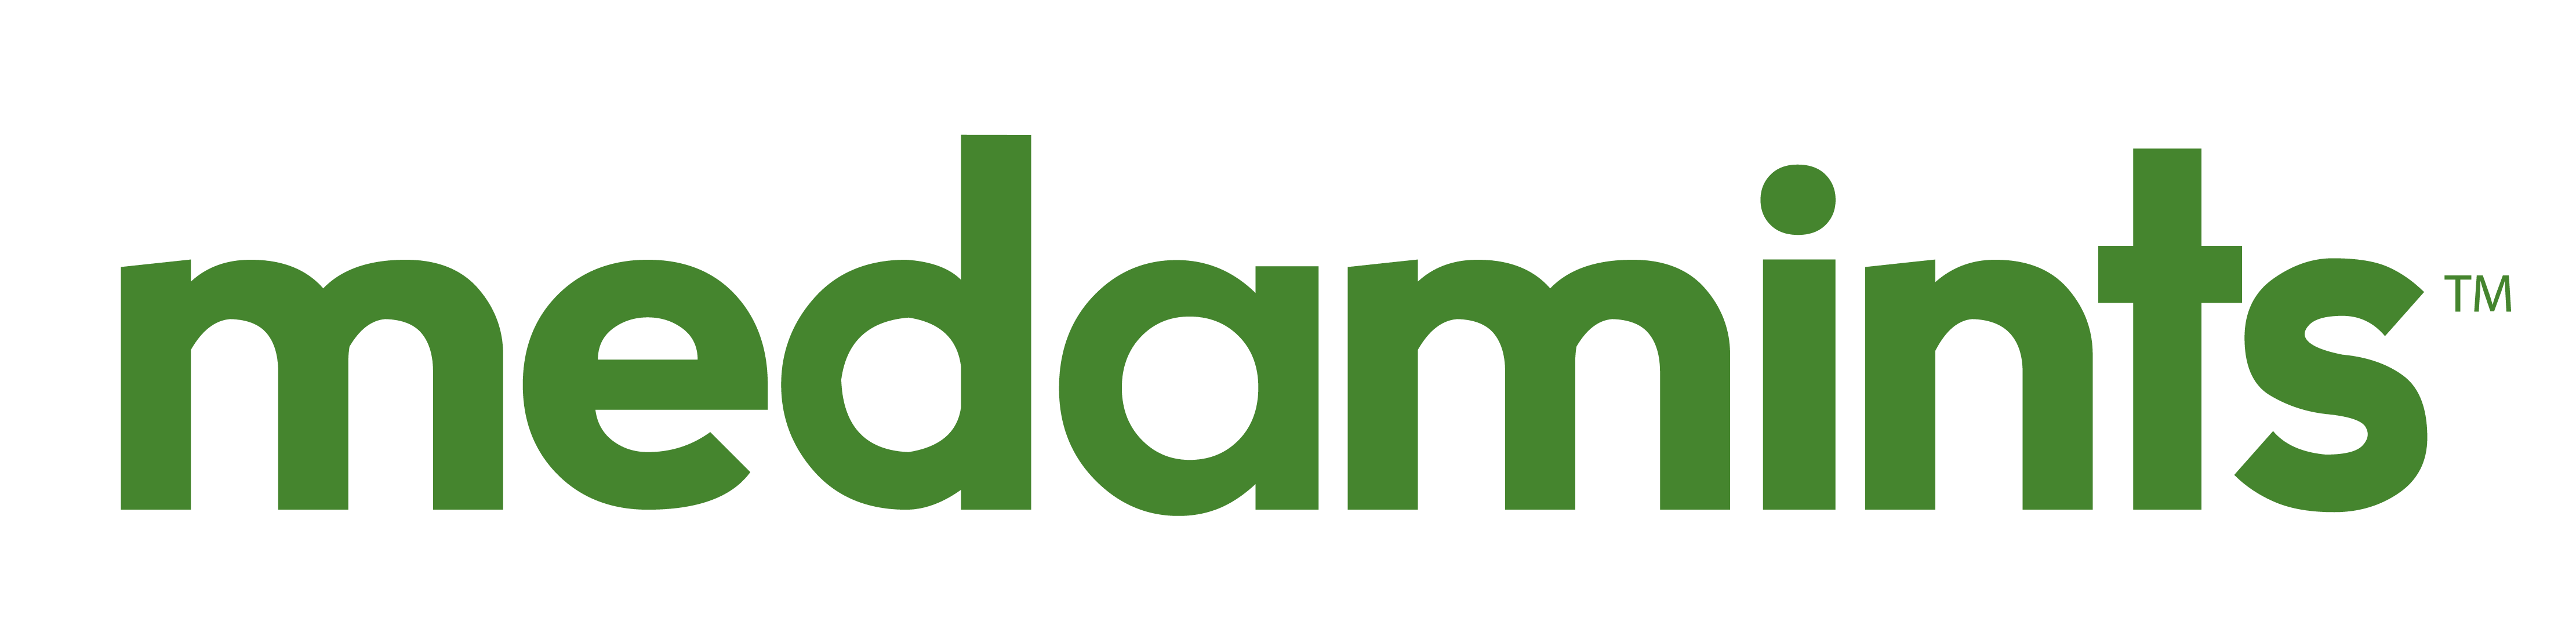 2017-medamints-logo-green-03